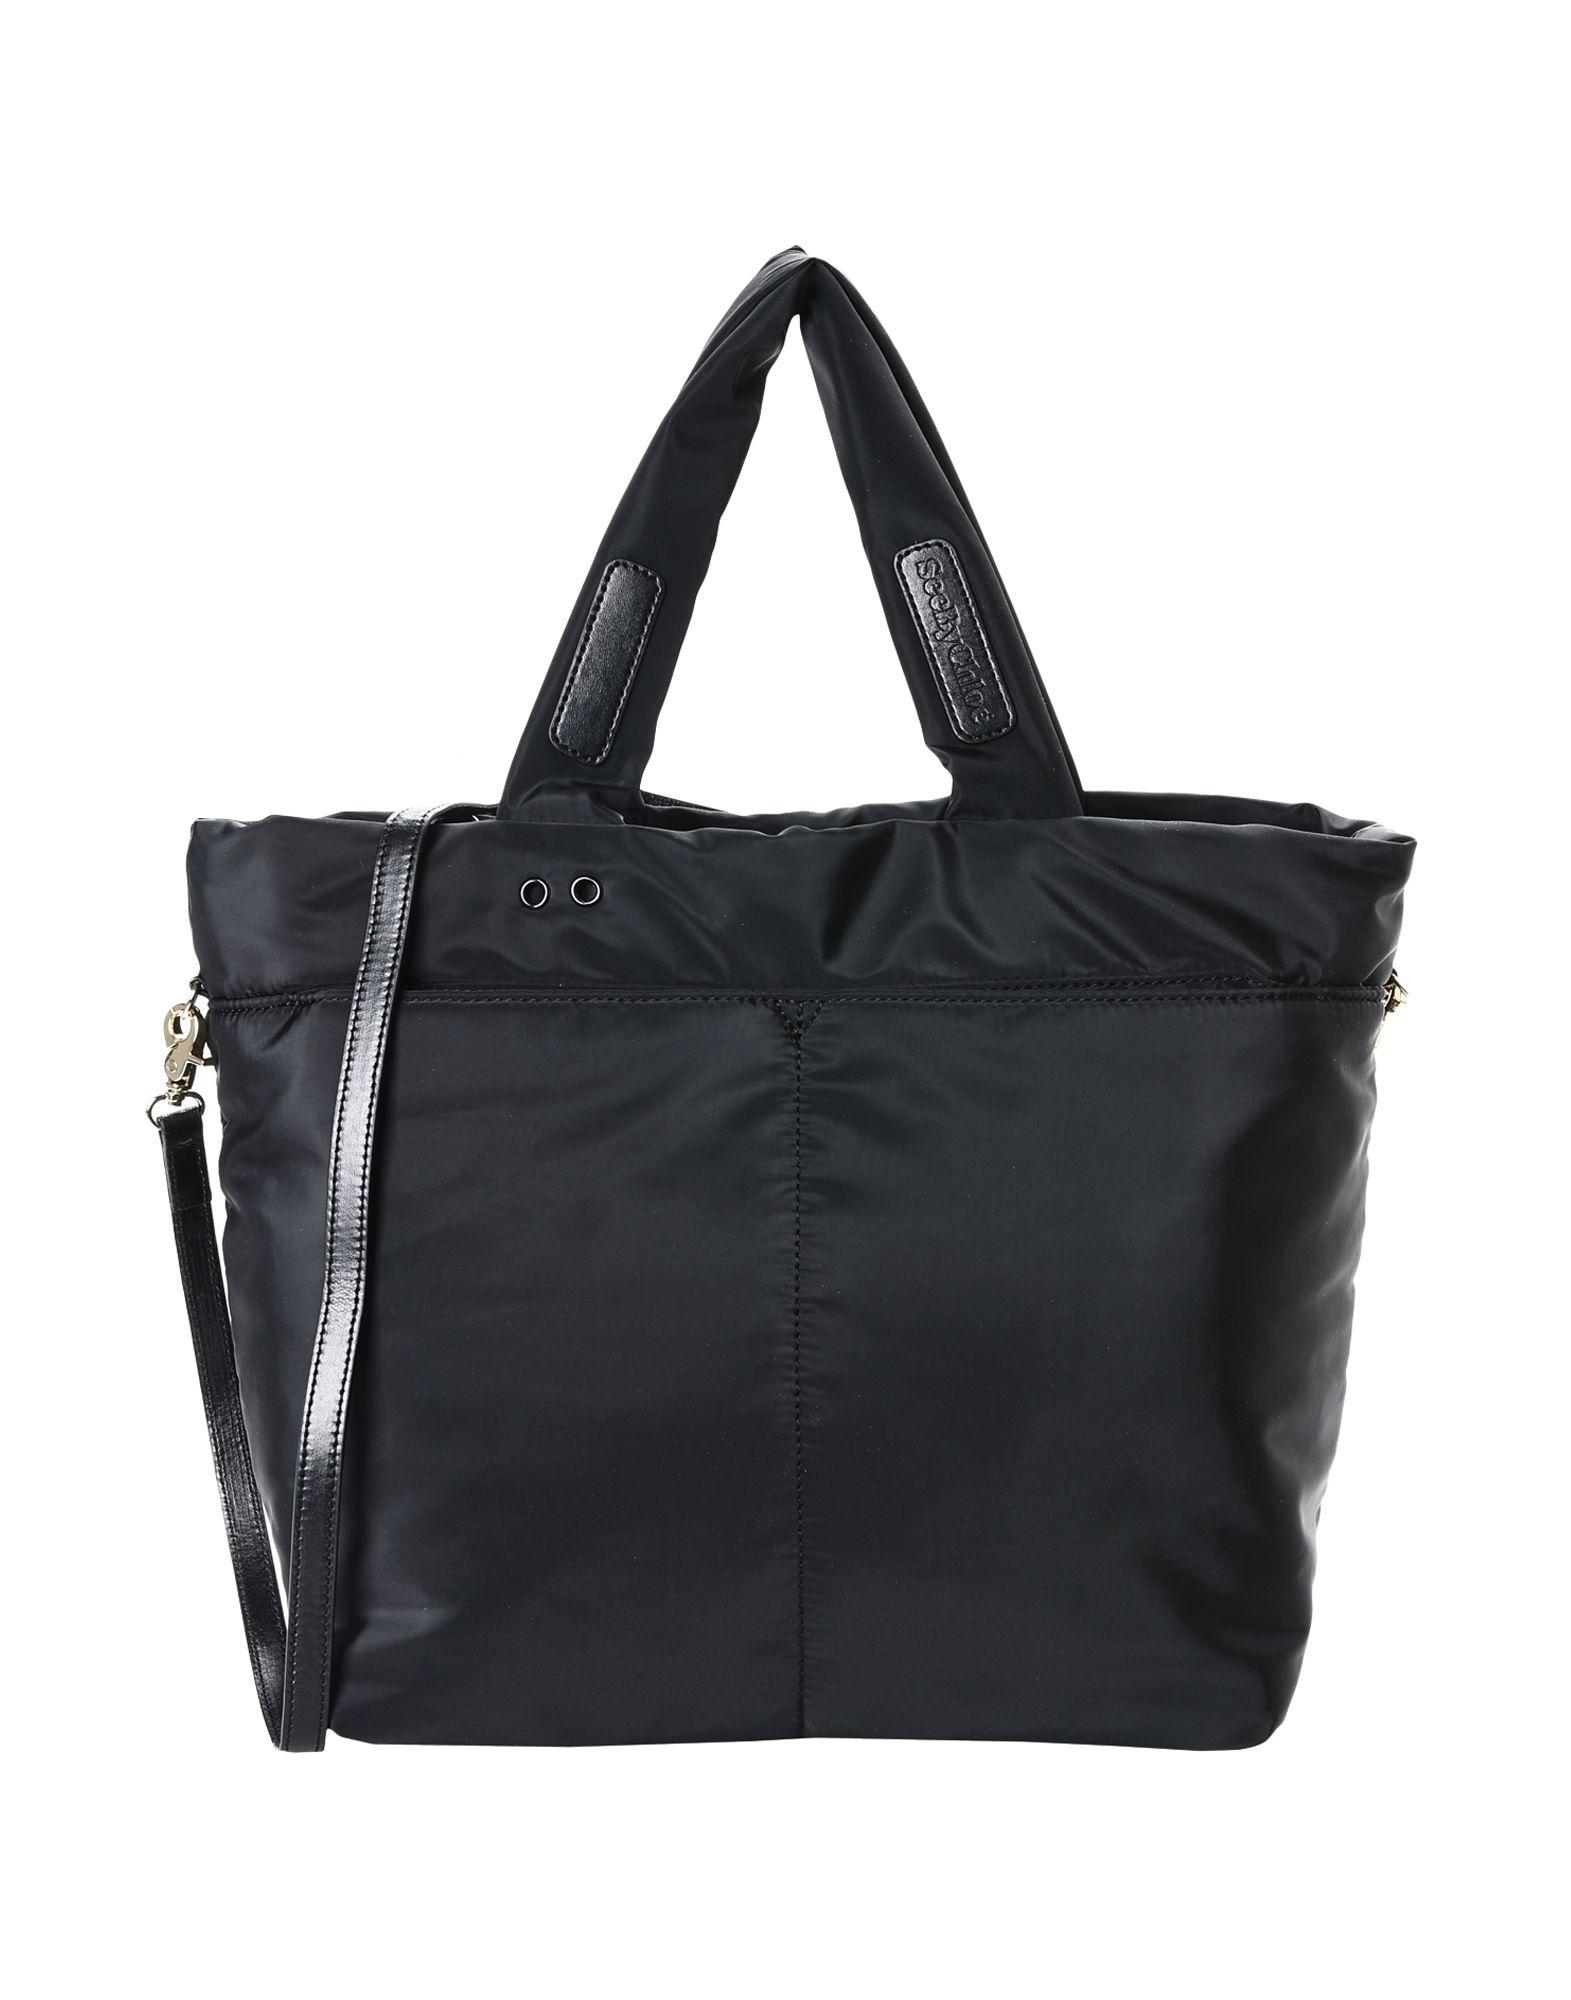 Borsa A Mano See By Chloé 9S7921 Tote Bags - Donna - Acquista online su